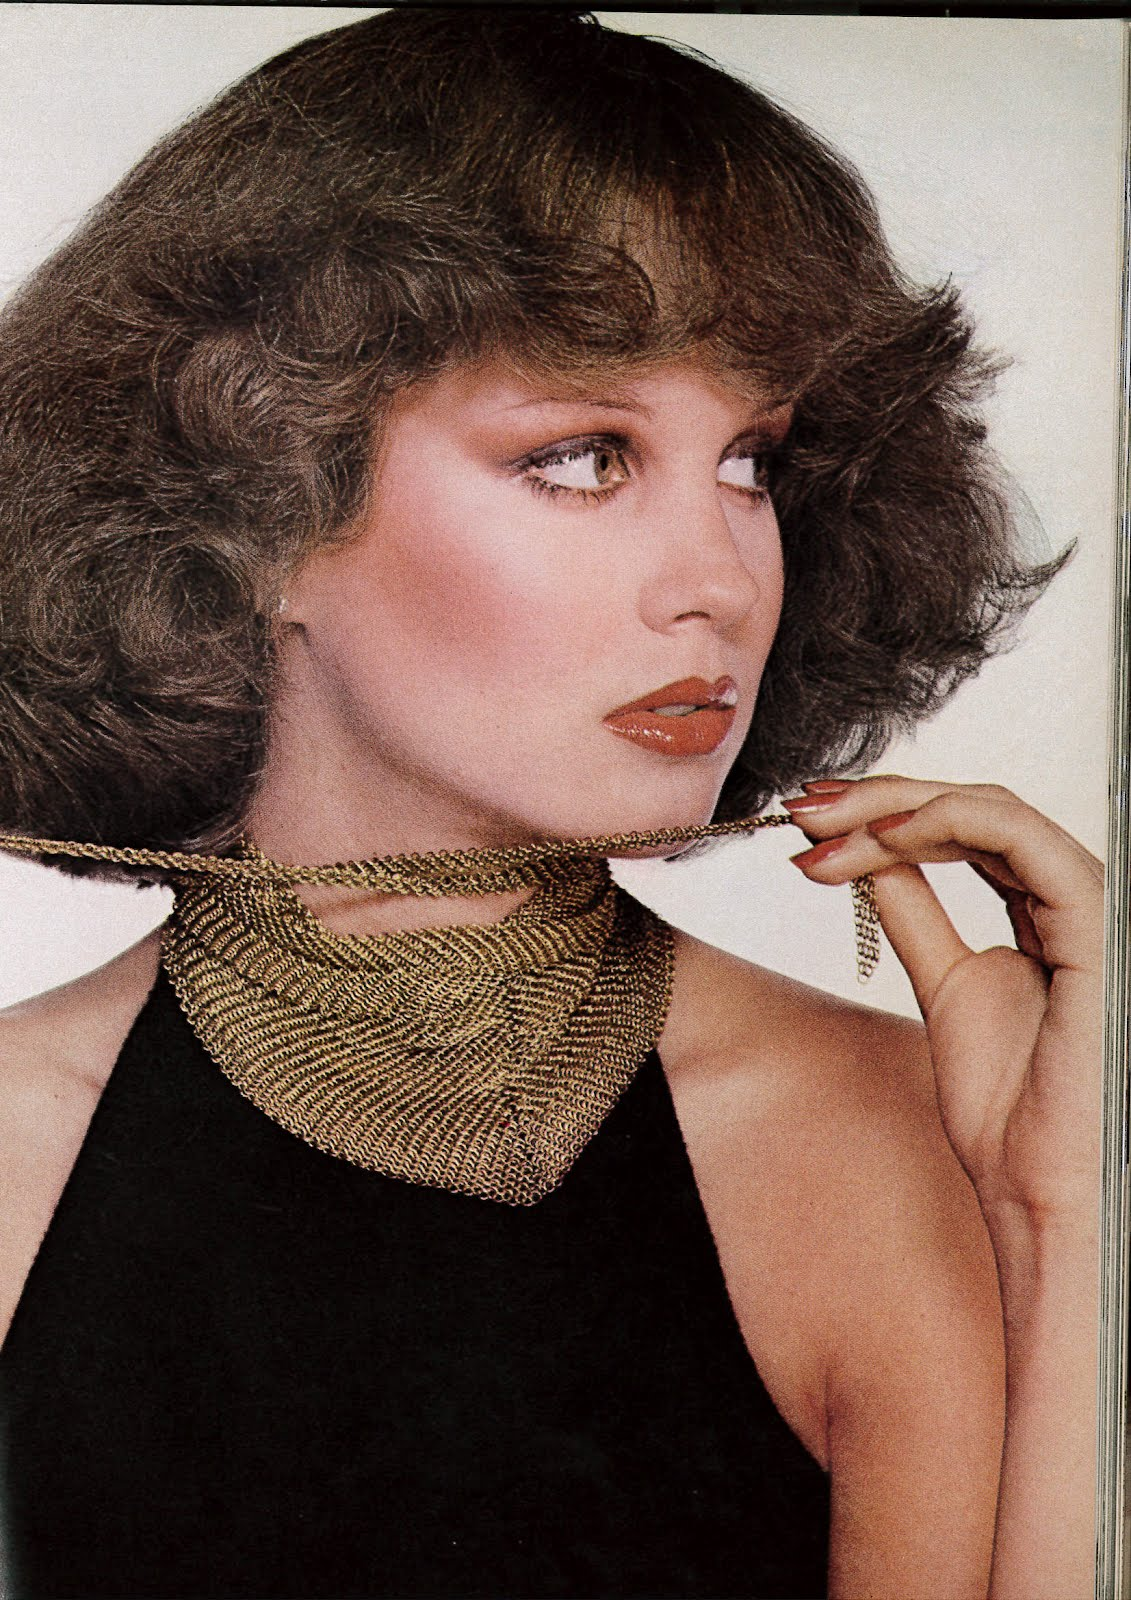 Tootsie Guevarra (b. 1980),Florence Turner XXX pics Sunshine Dizon (b. 1983),Kendra Lust